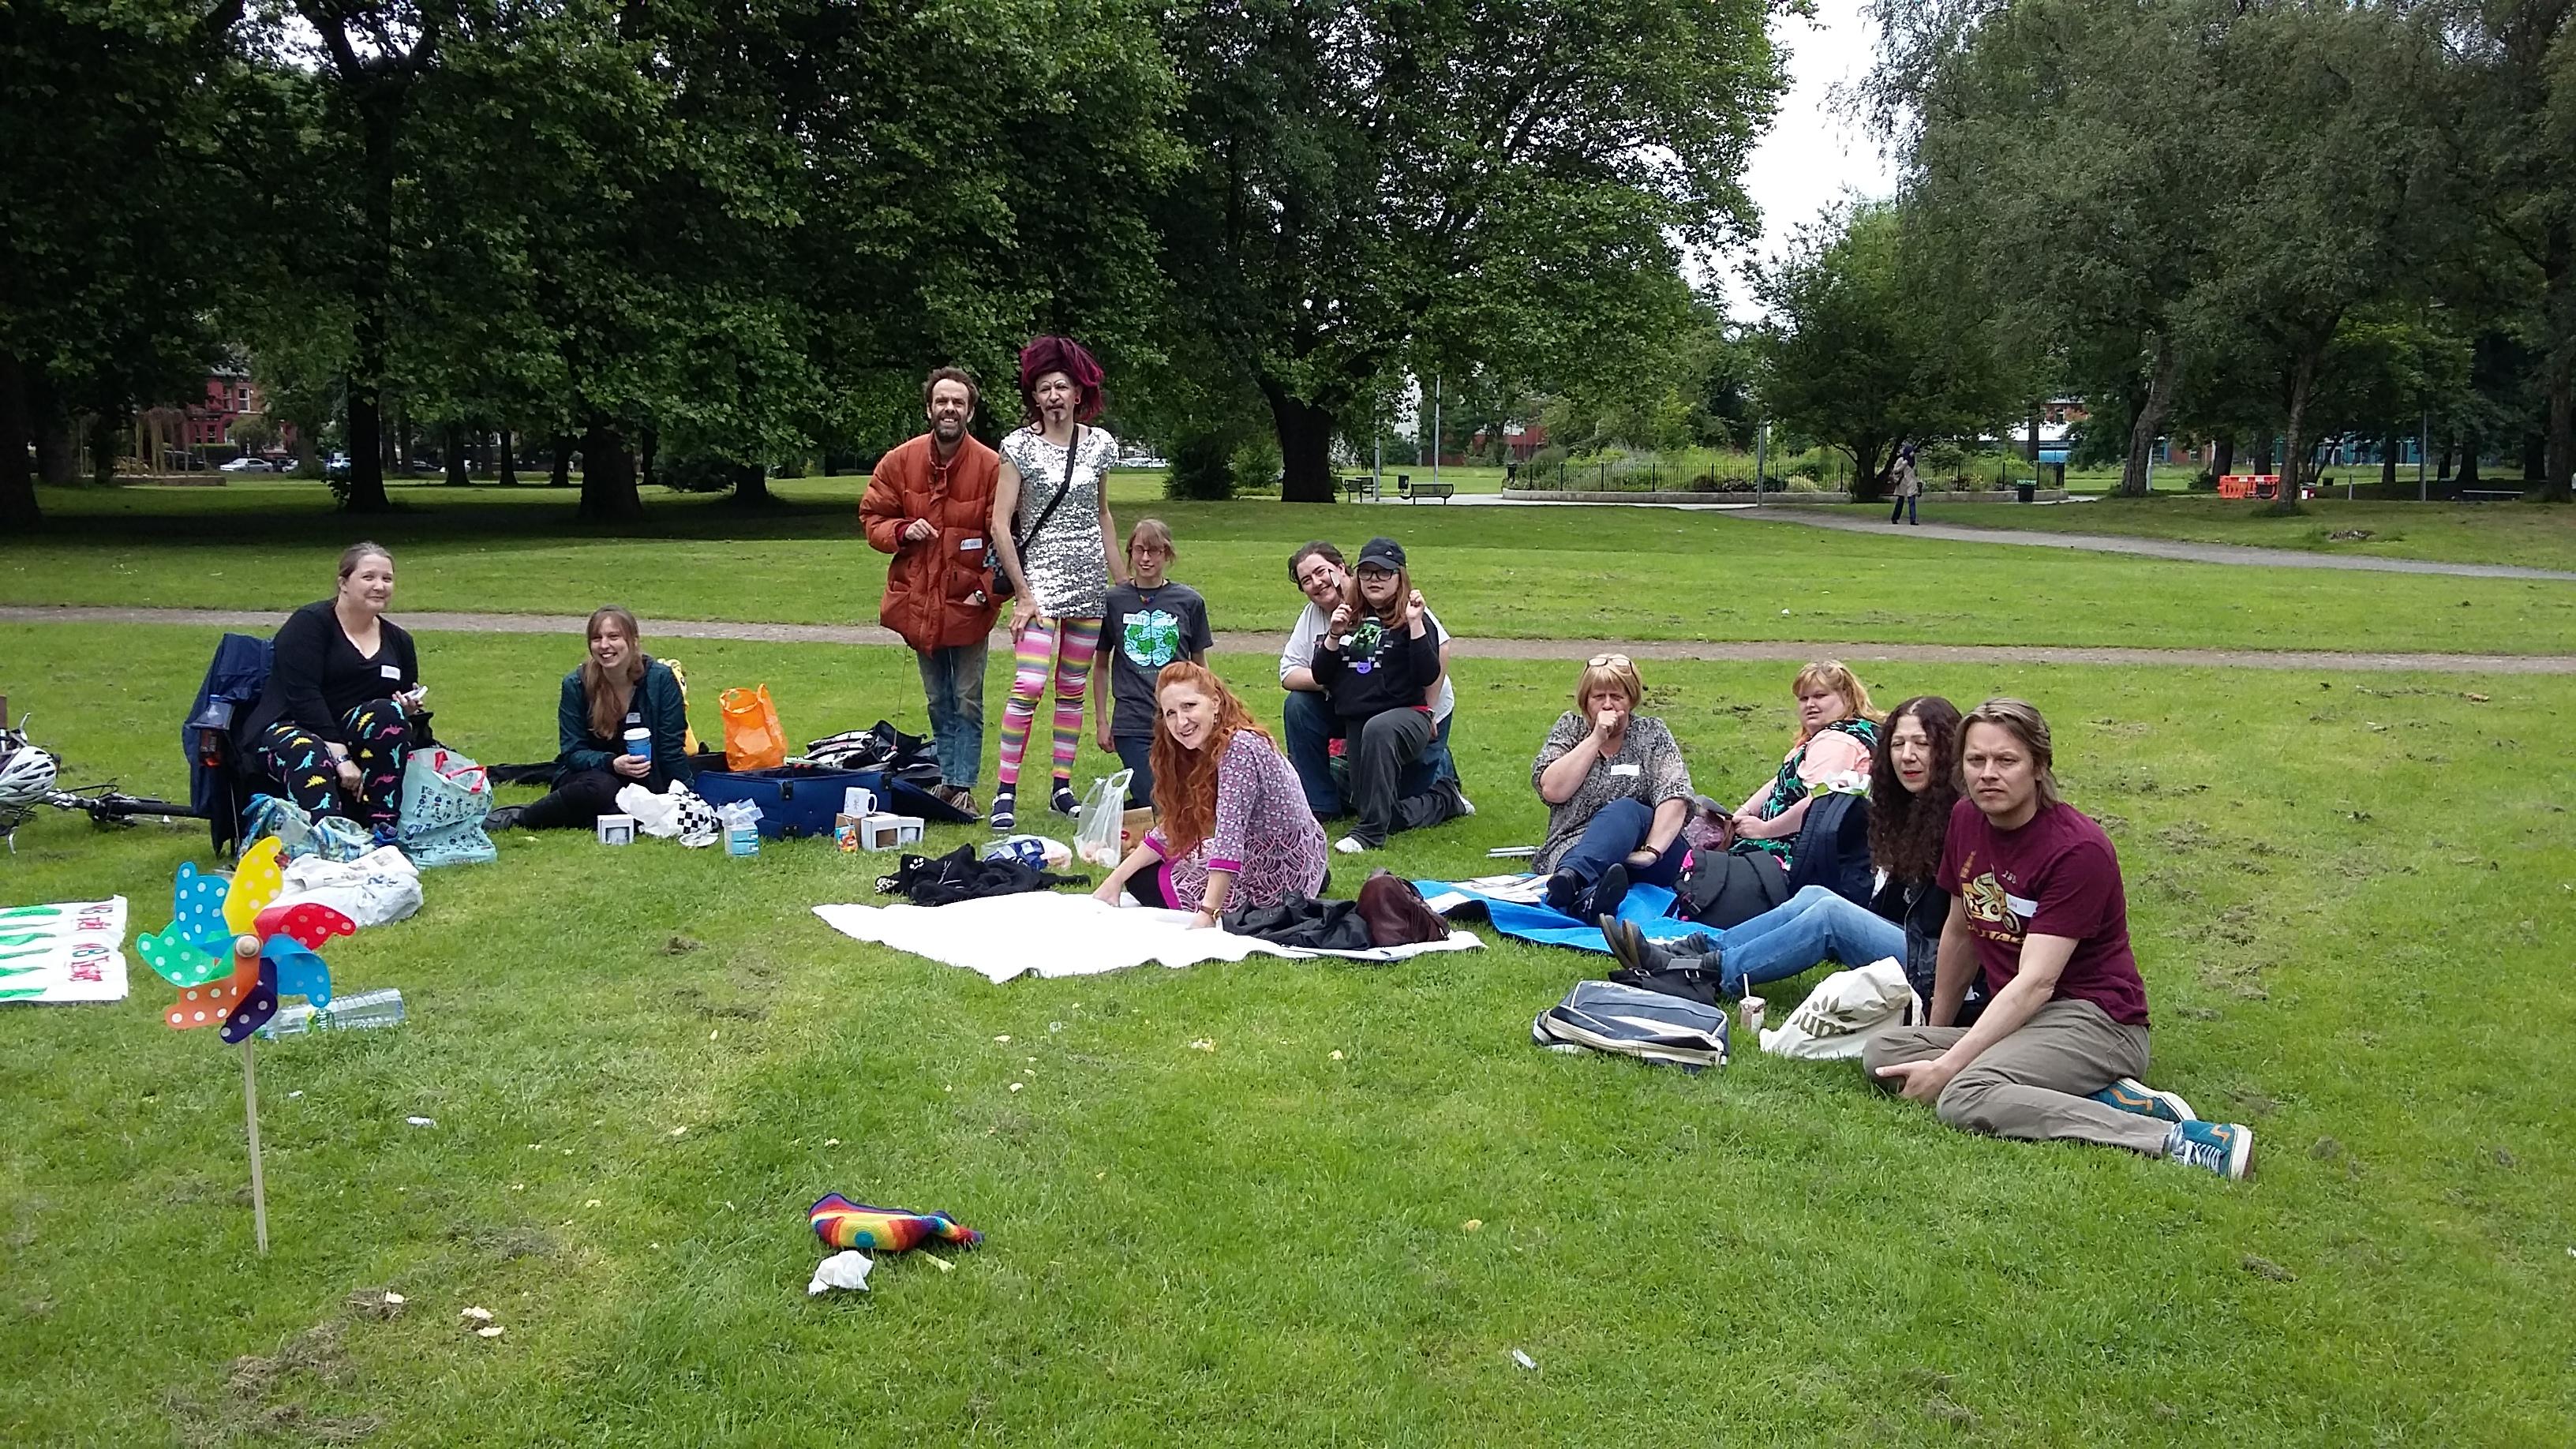 Autistic Pride Picnic in the Park